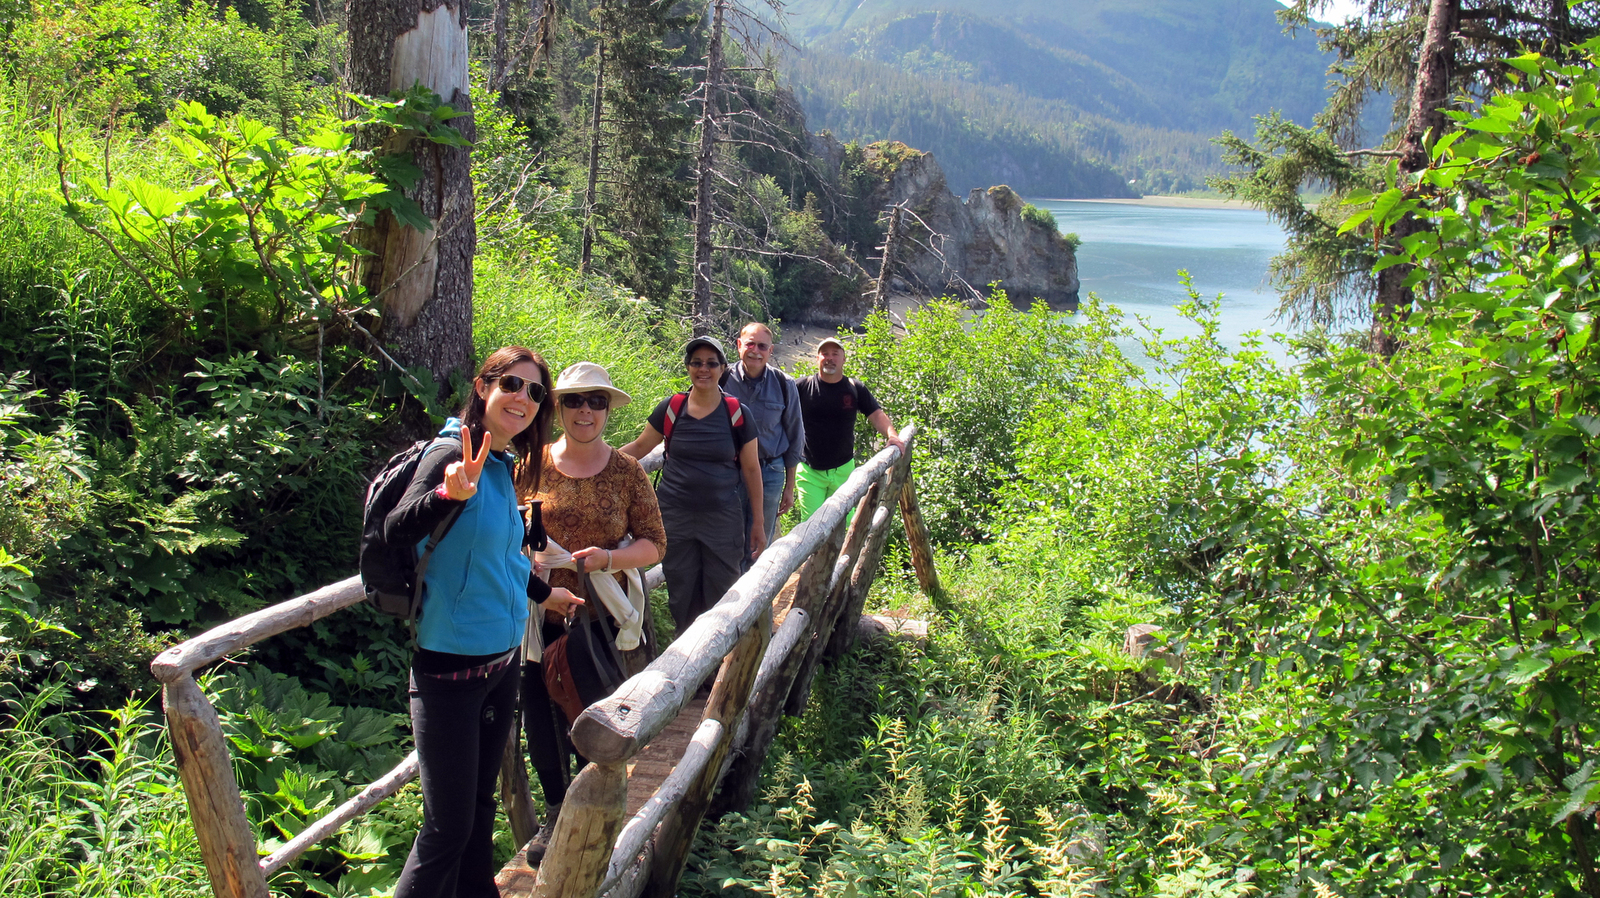 Hikers on a bridge in Kachemak State Park